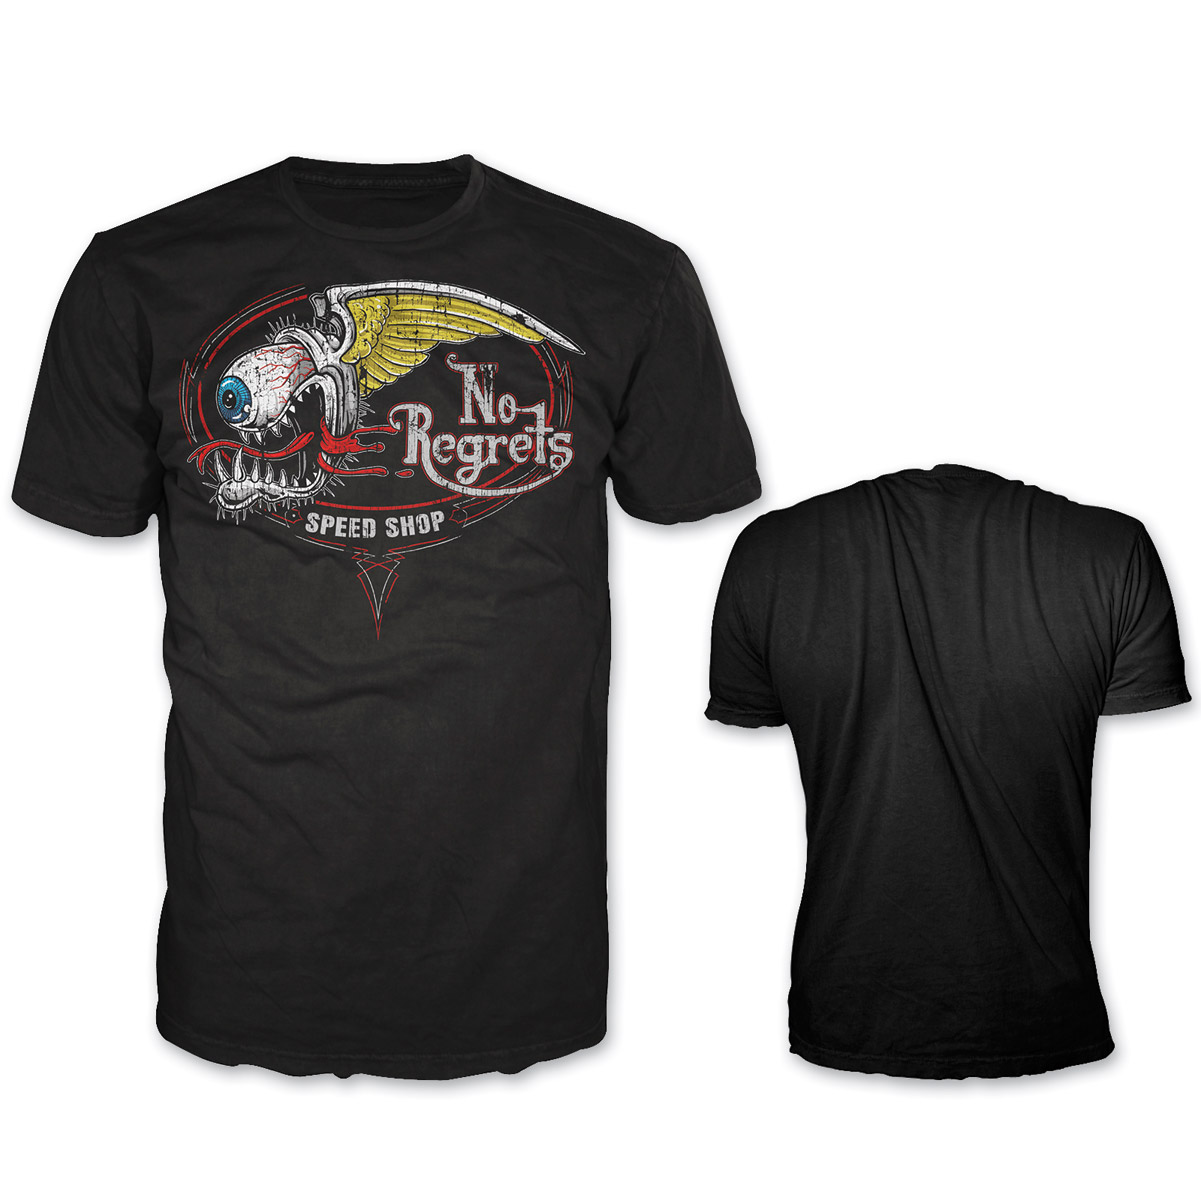 Lethal Threat Highway Outlaw Men's No Regrets Speed Shop Black T-Shirt